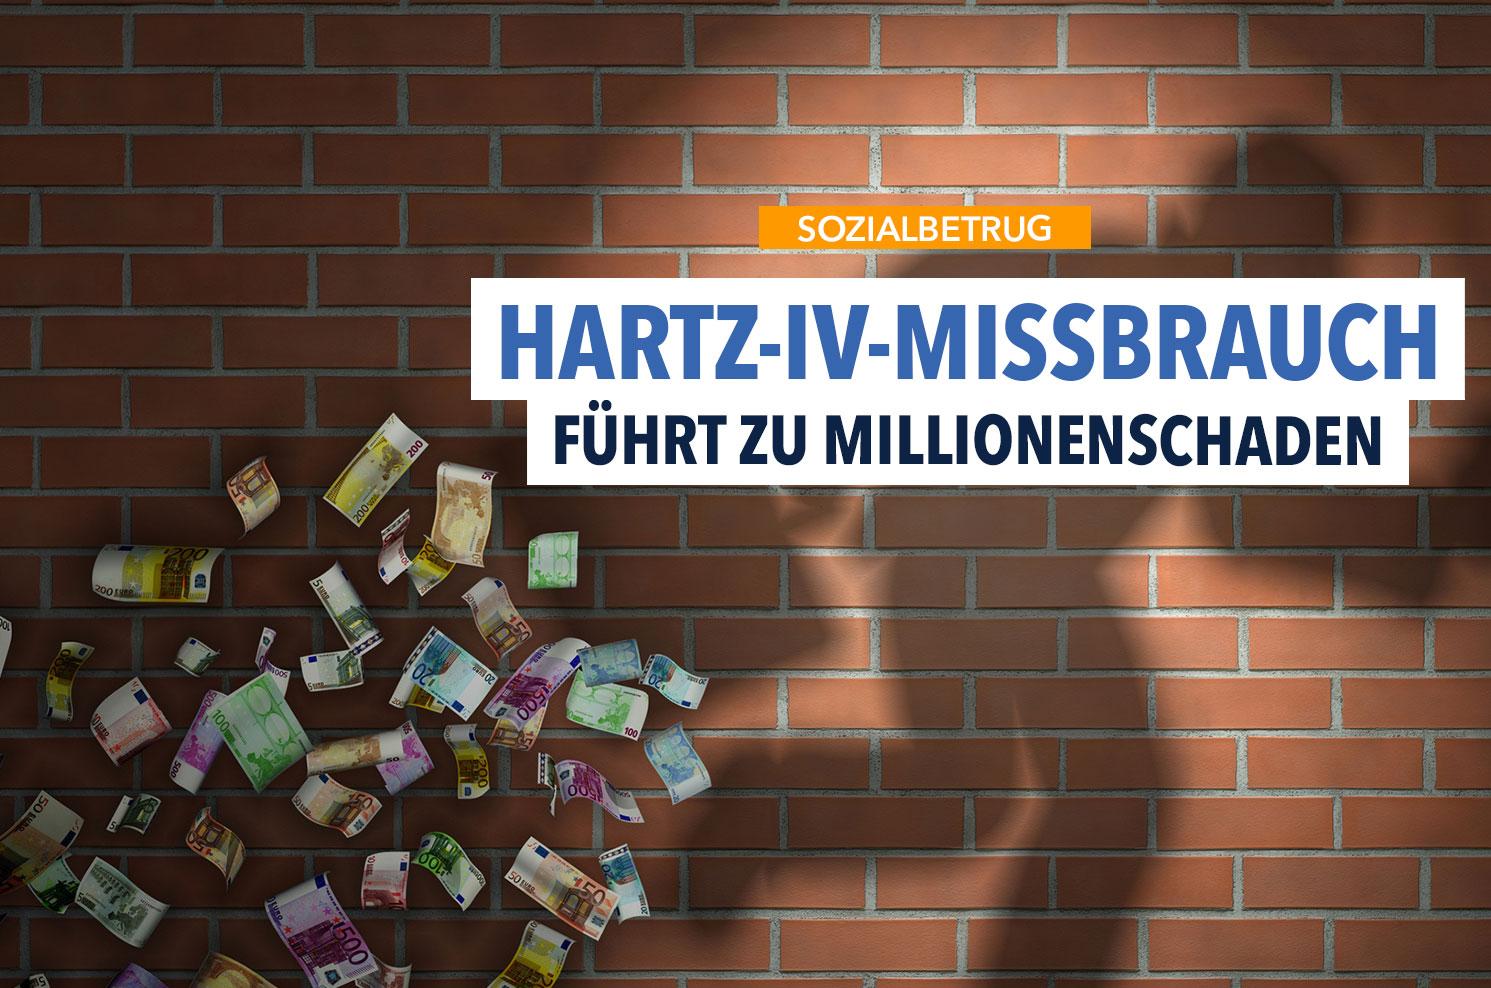 Hartz-IV-Missbrauch